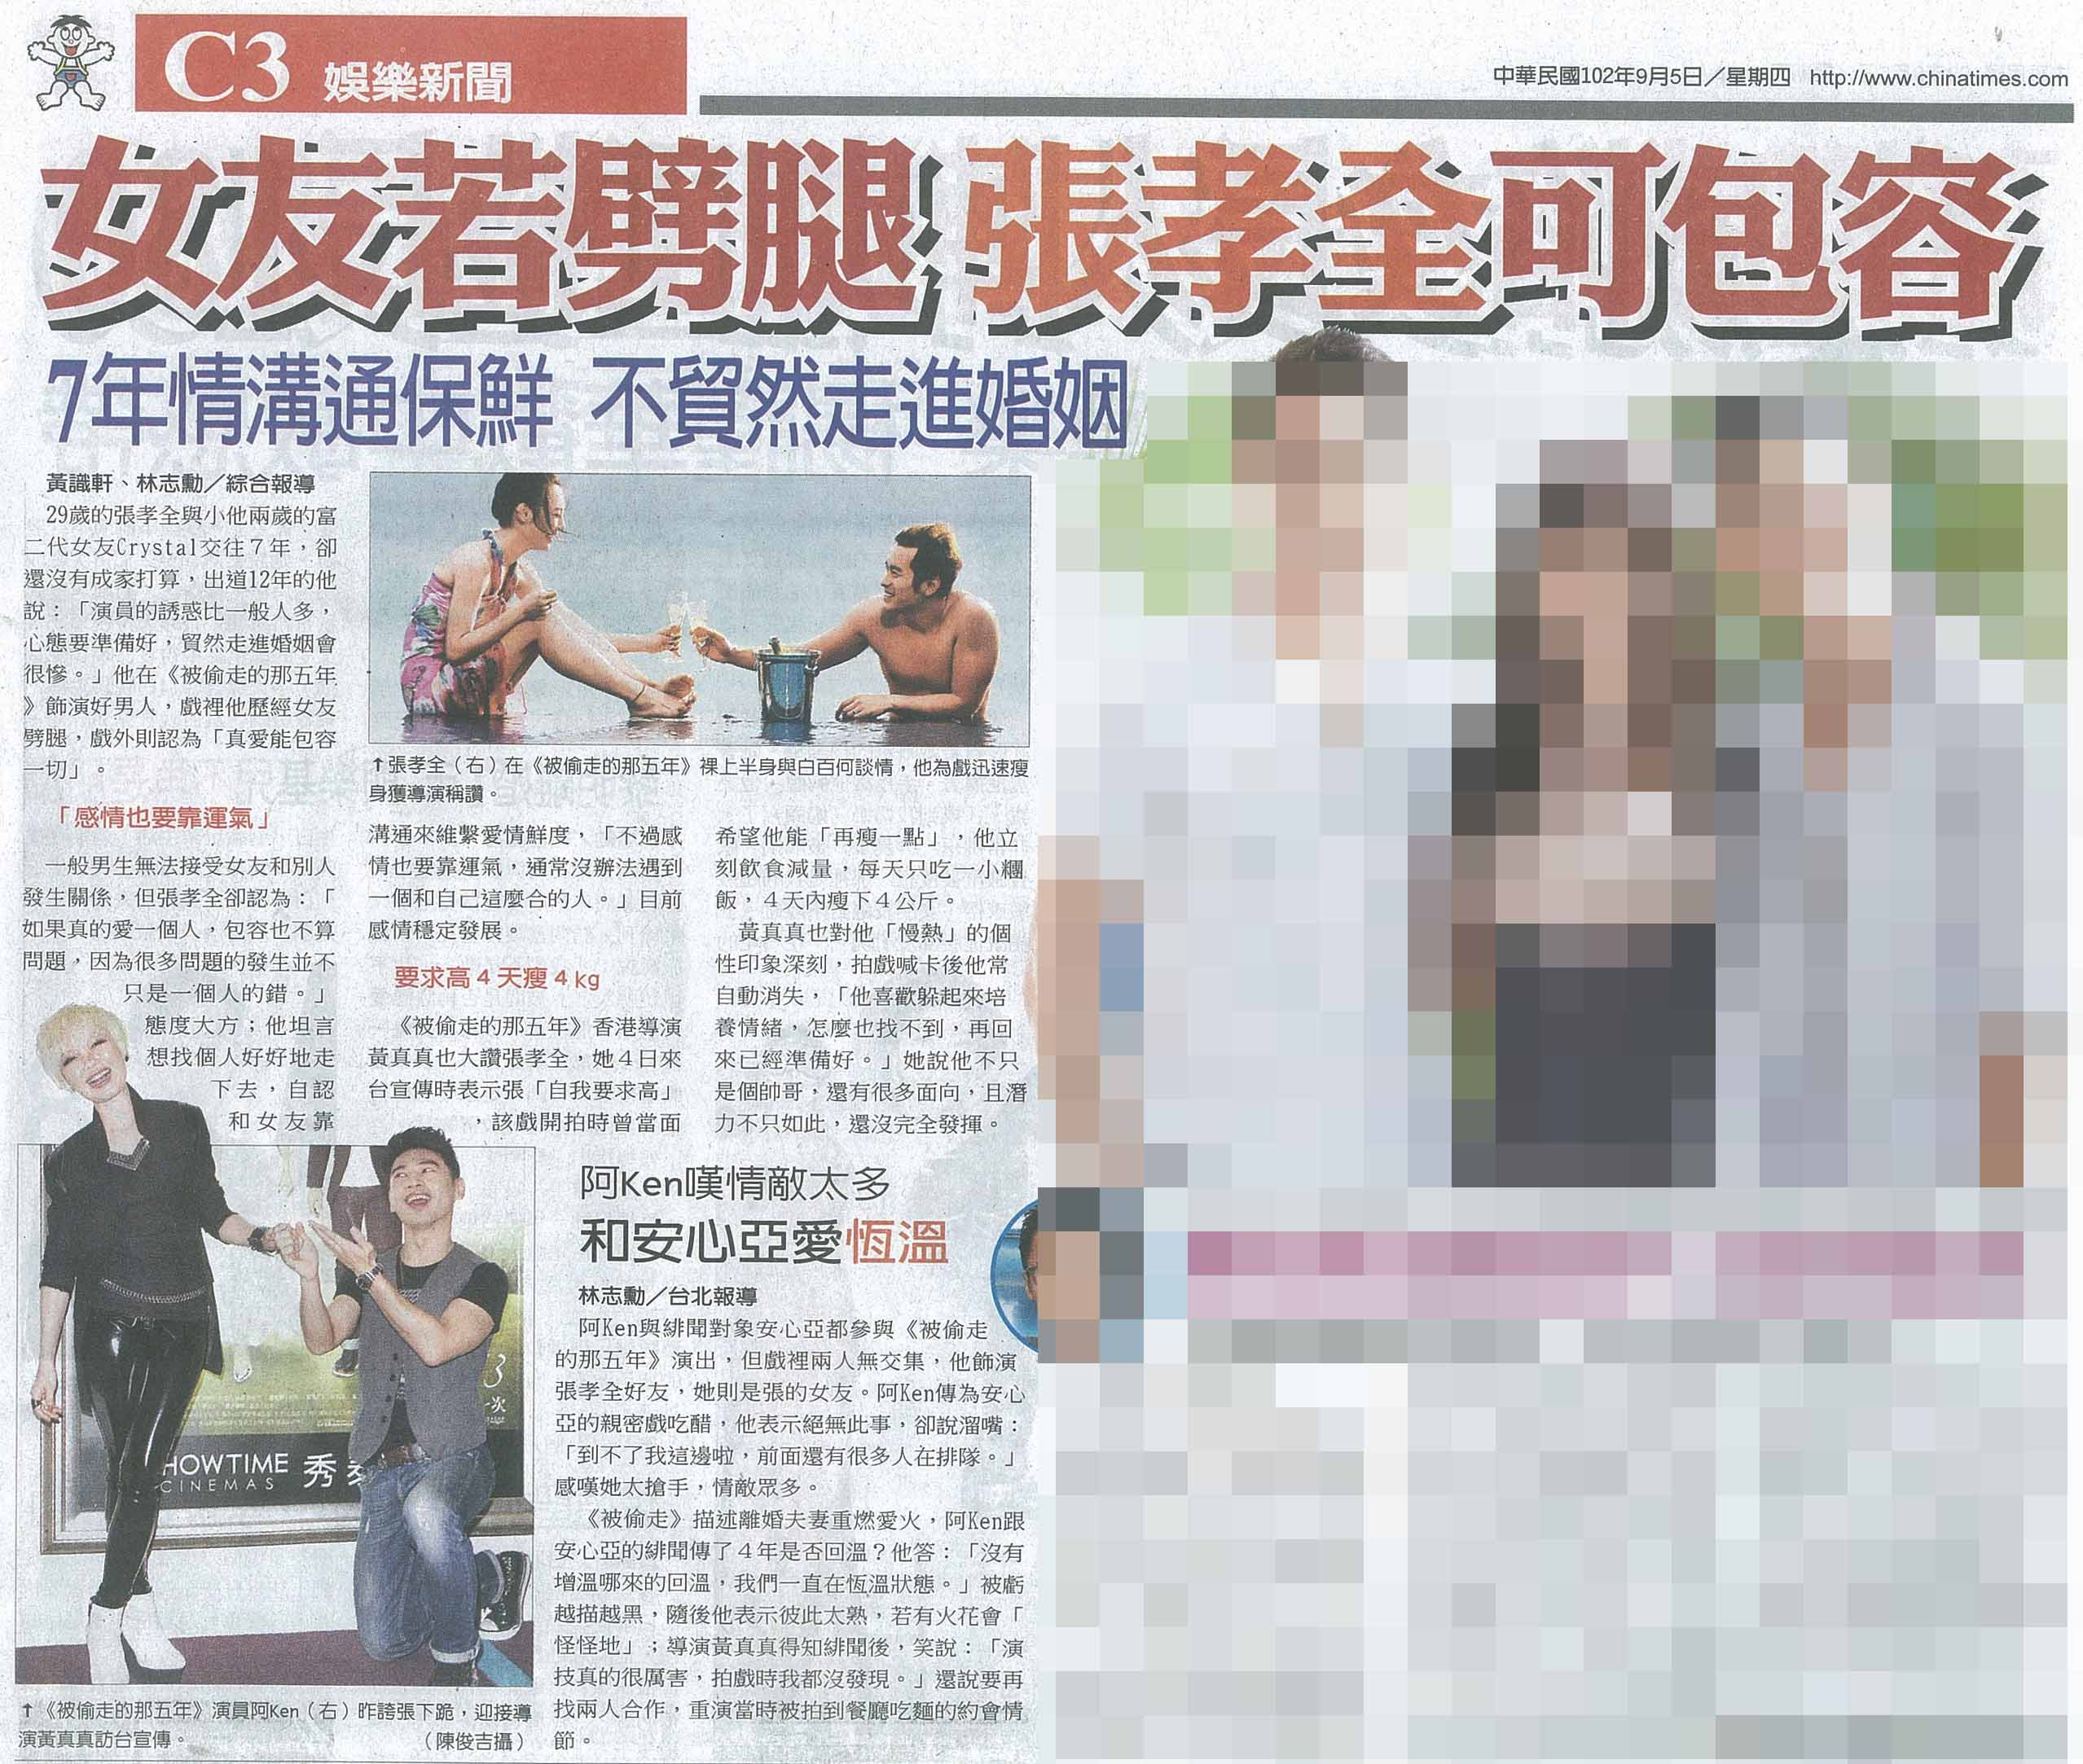 NP露出_2013.09.05_《被偷走的那五年》_中國時報_女友若劈腿 張孝全可包容